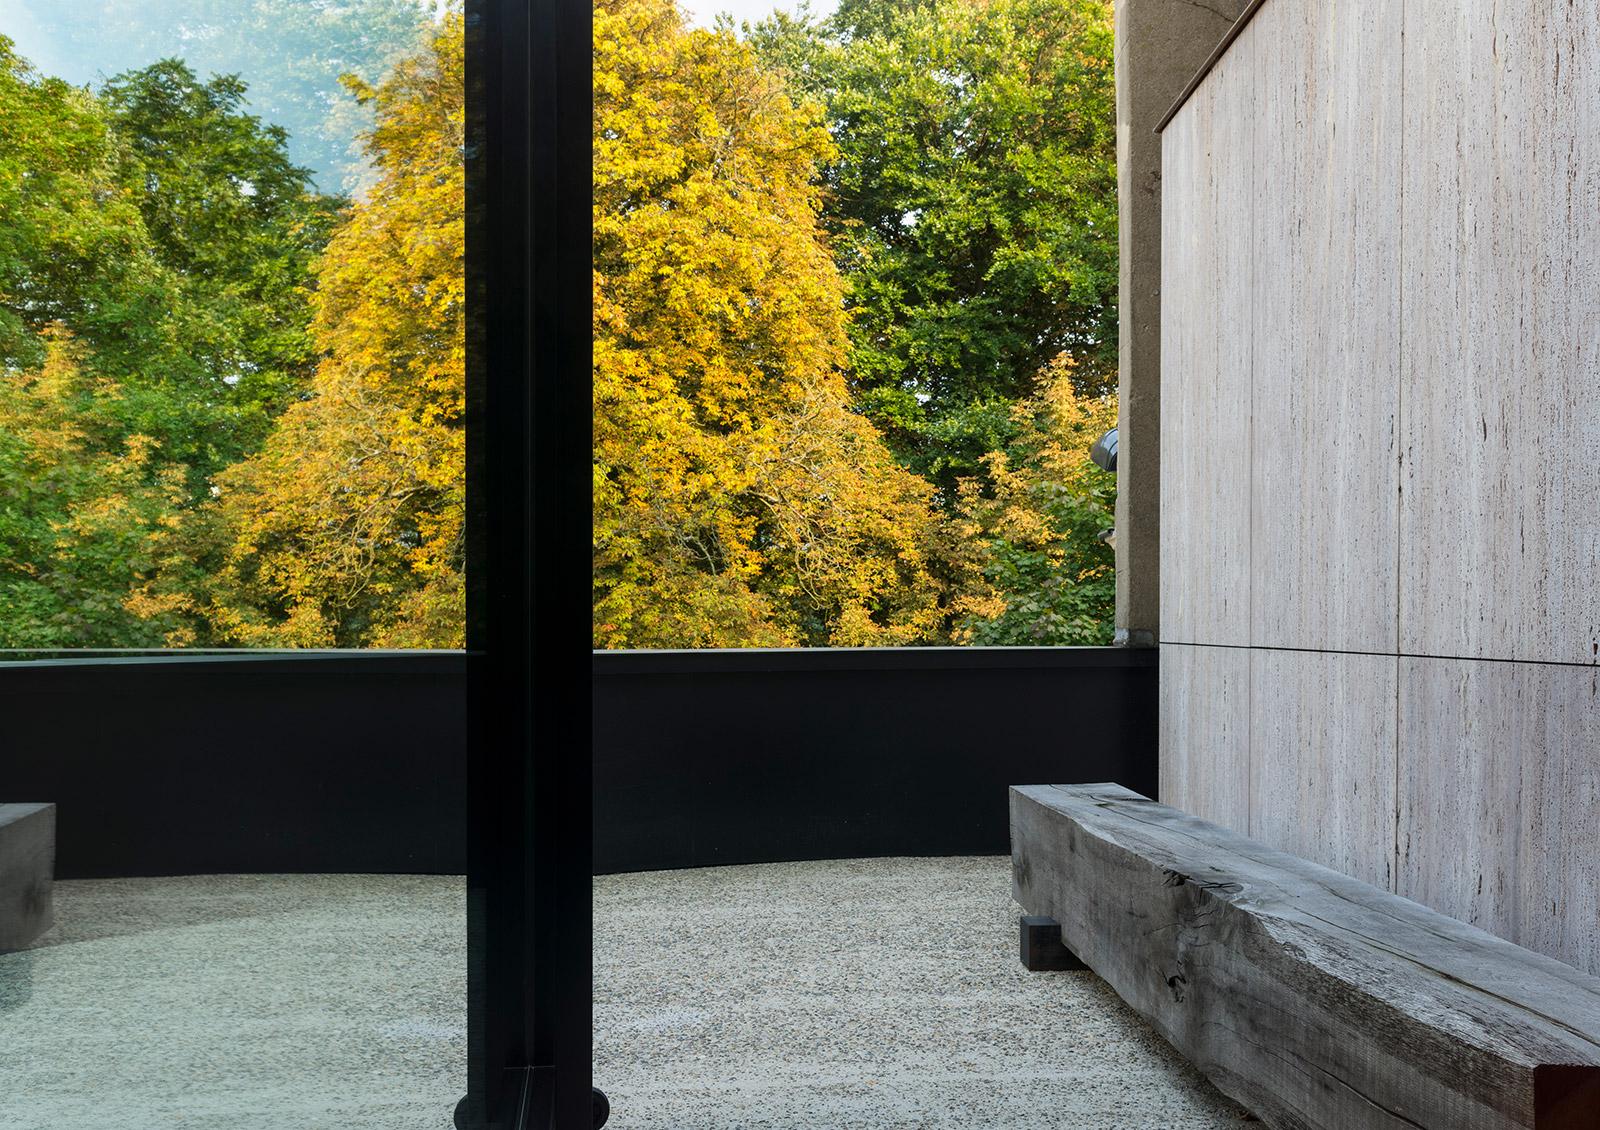 Architect Glenn Sestig's modernist townhouse is for sale in Ghent